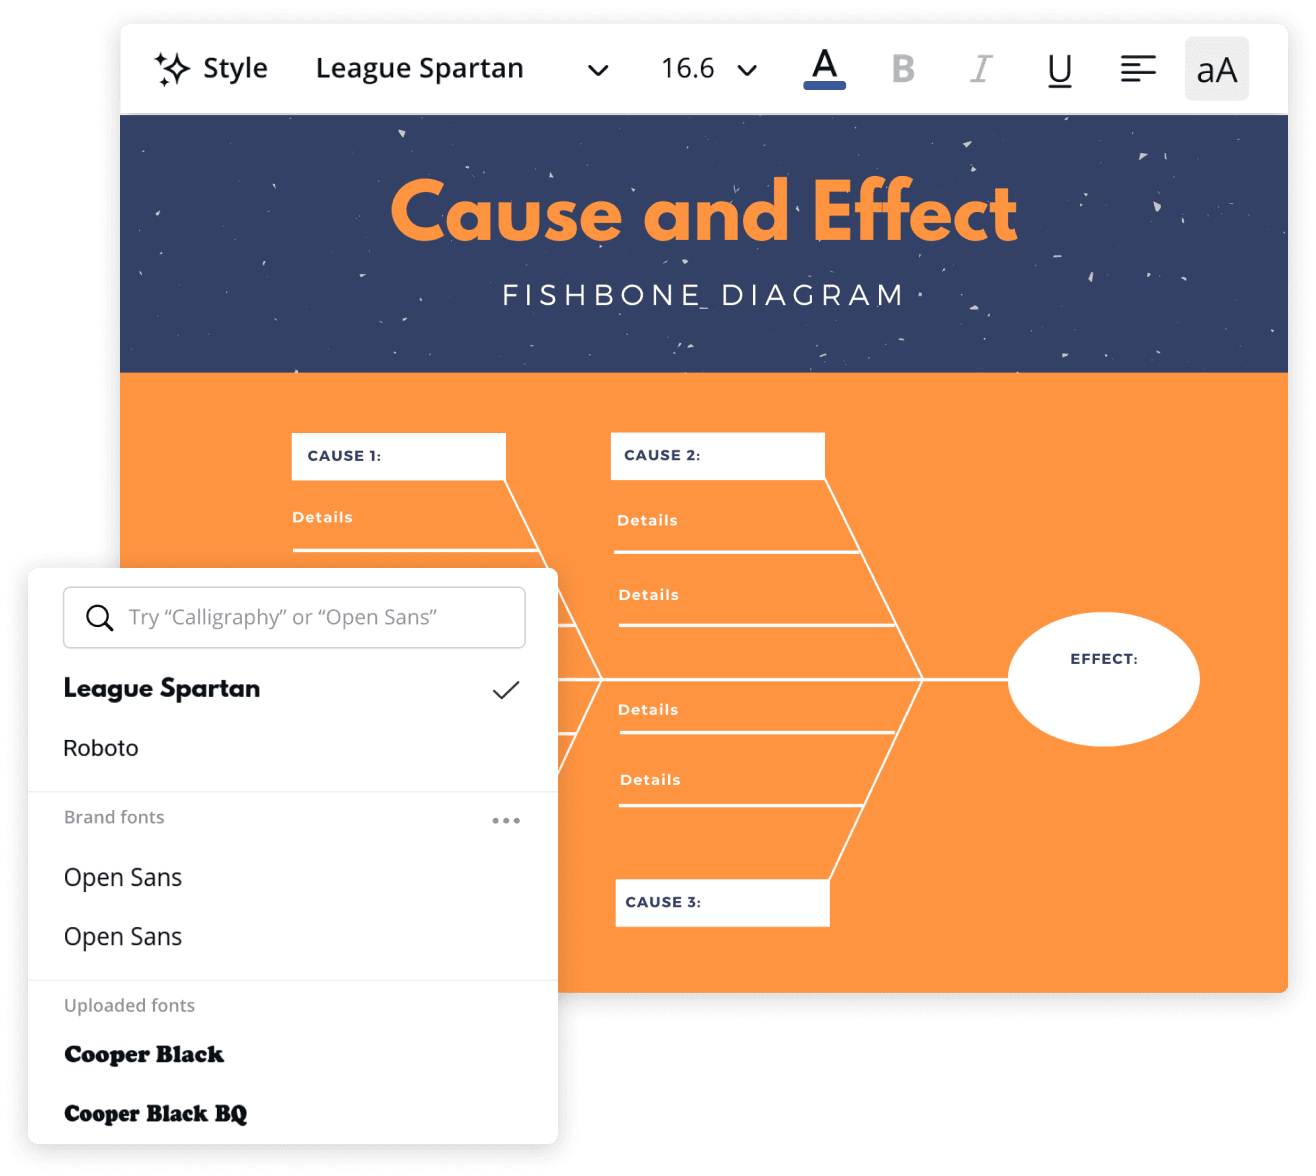 fishbone-diagram-fonts